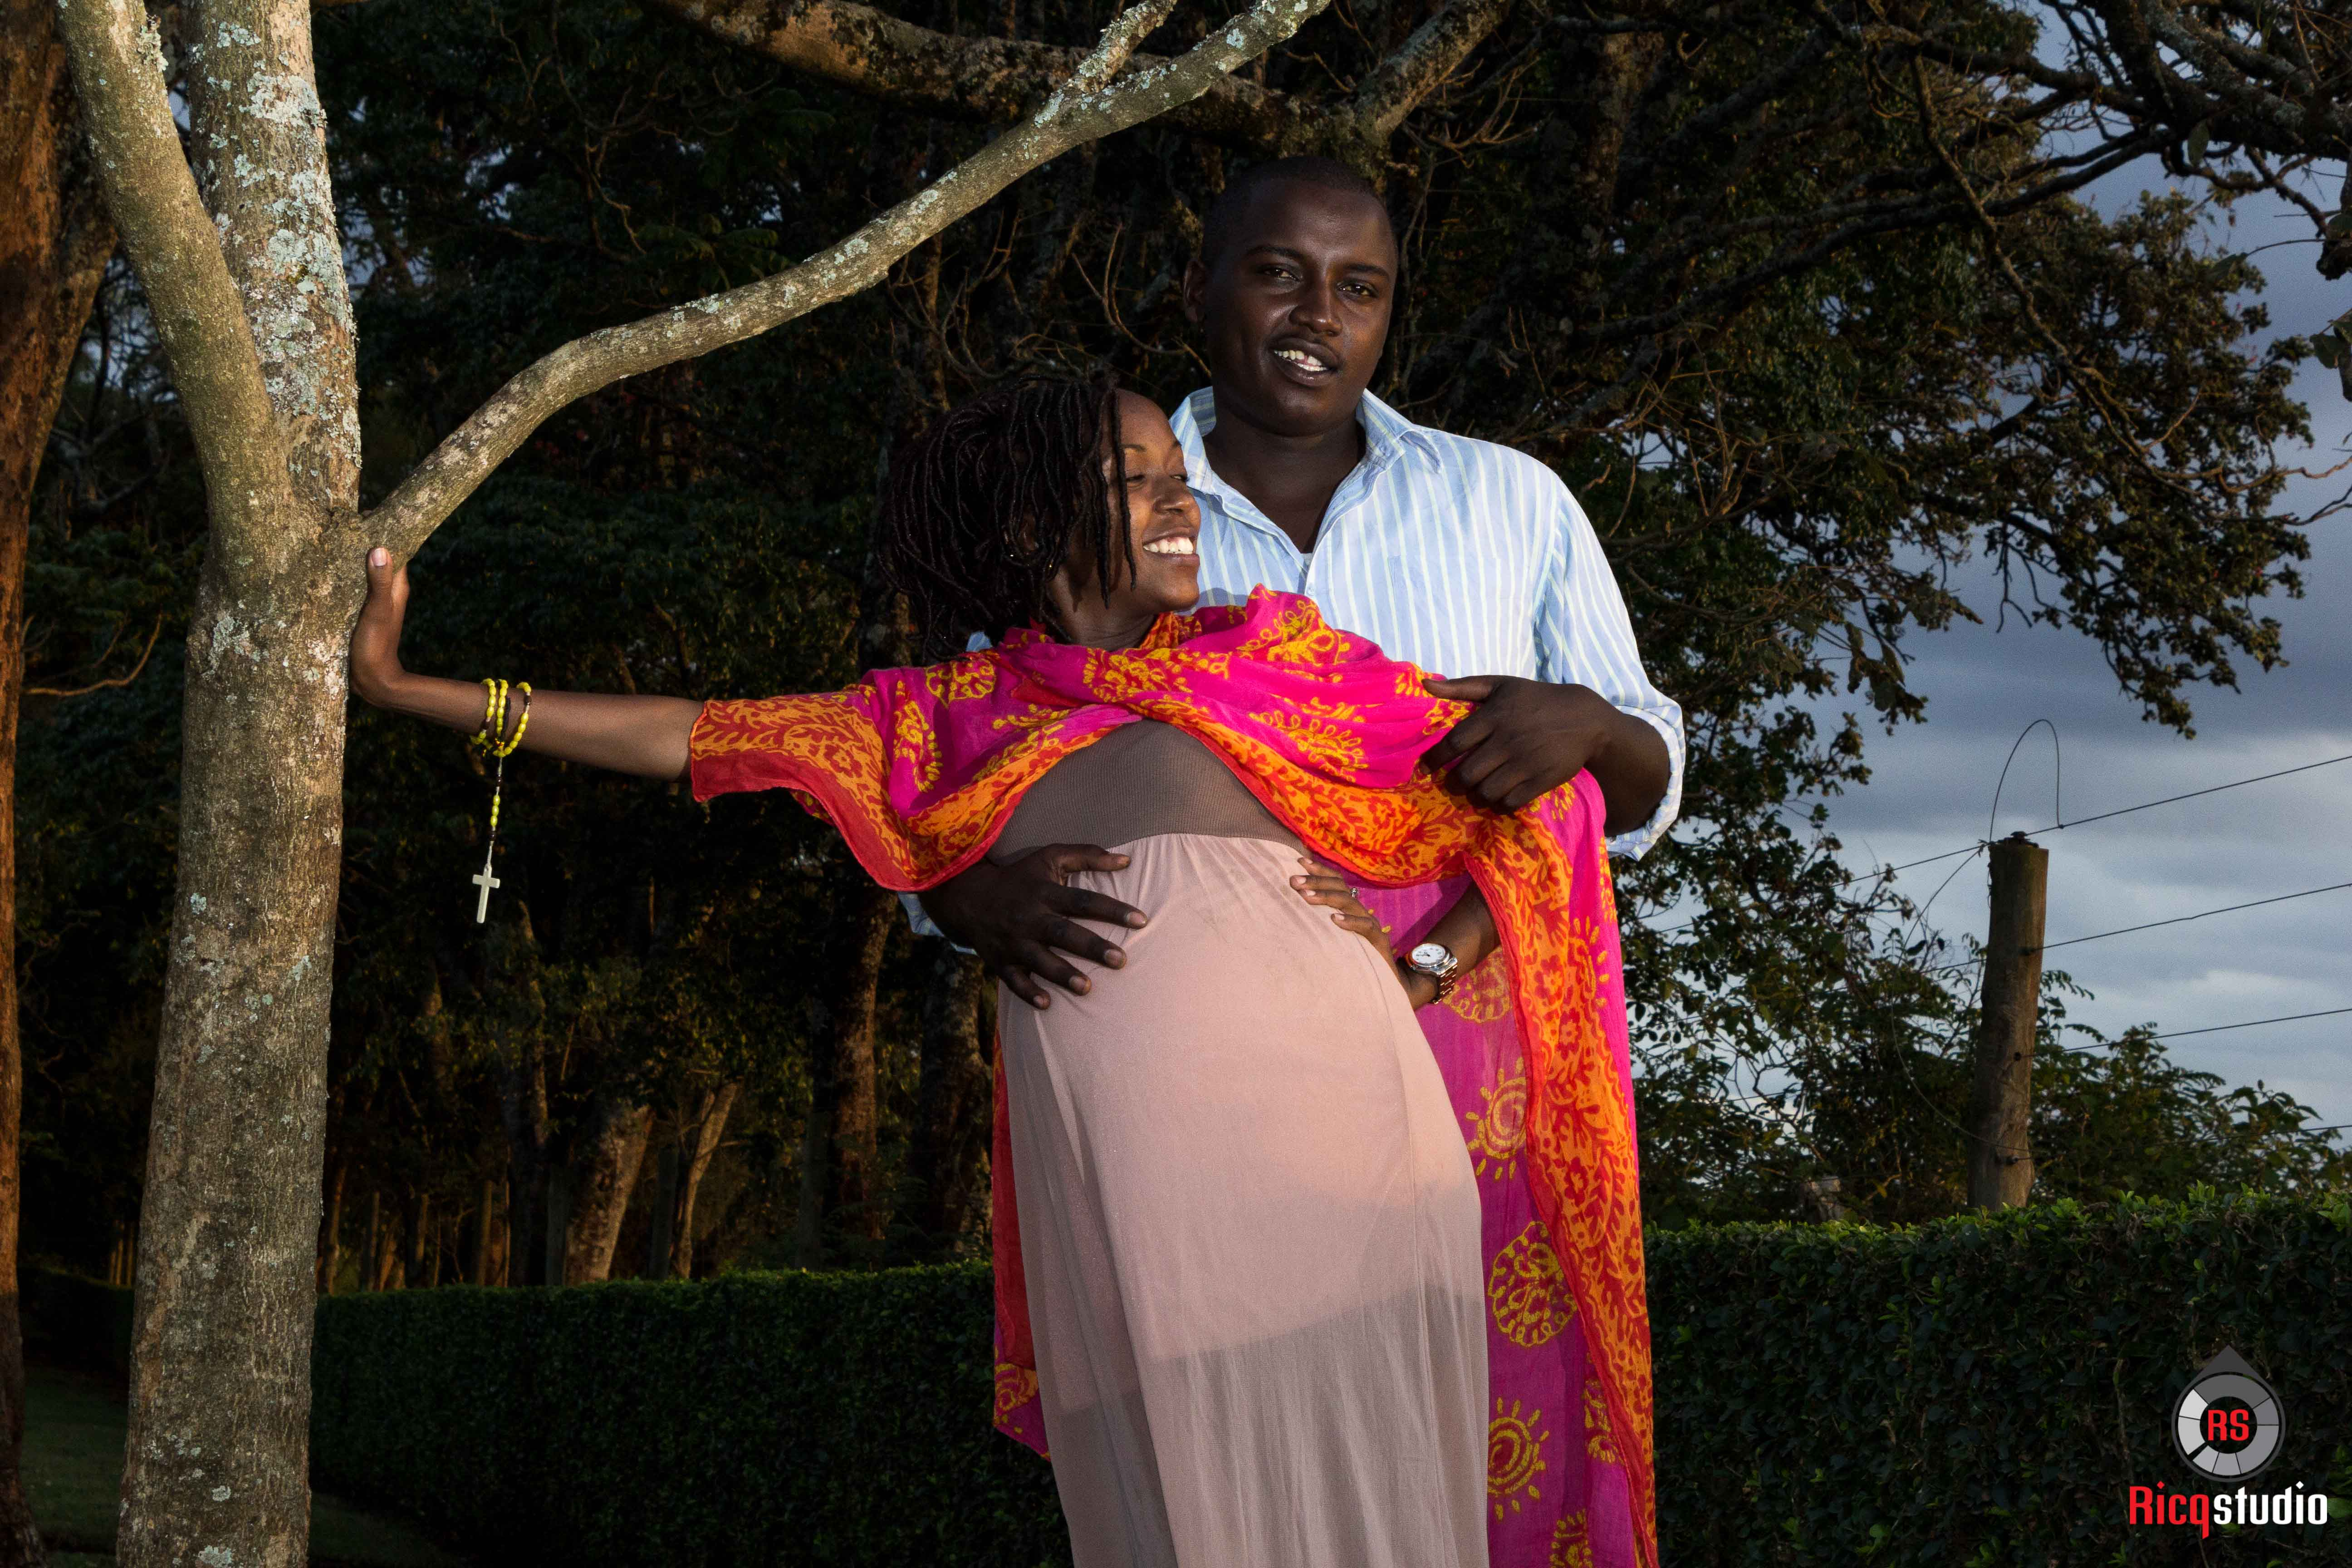 wedding photographer_ engagement in Kenya_ricqstudio-48